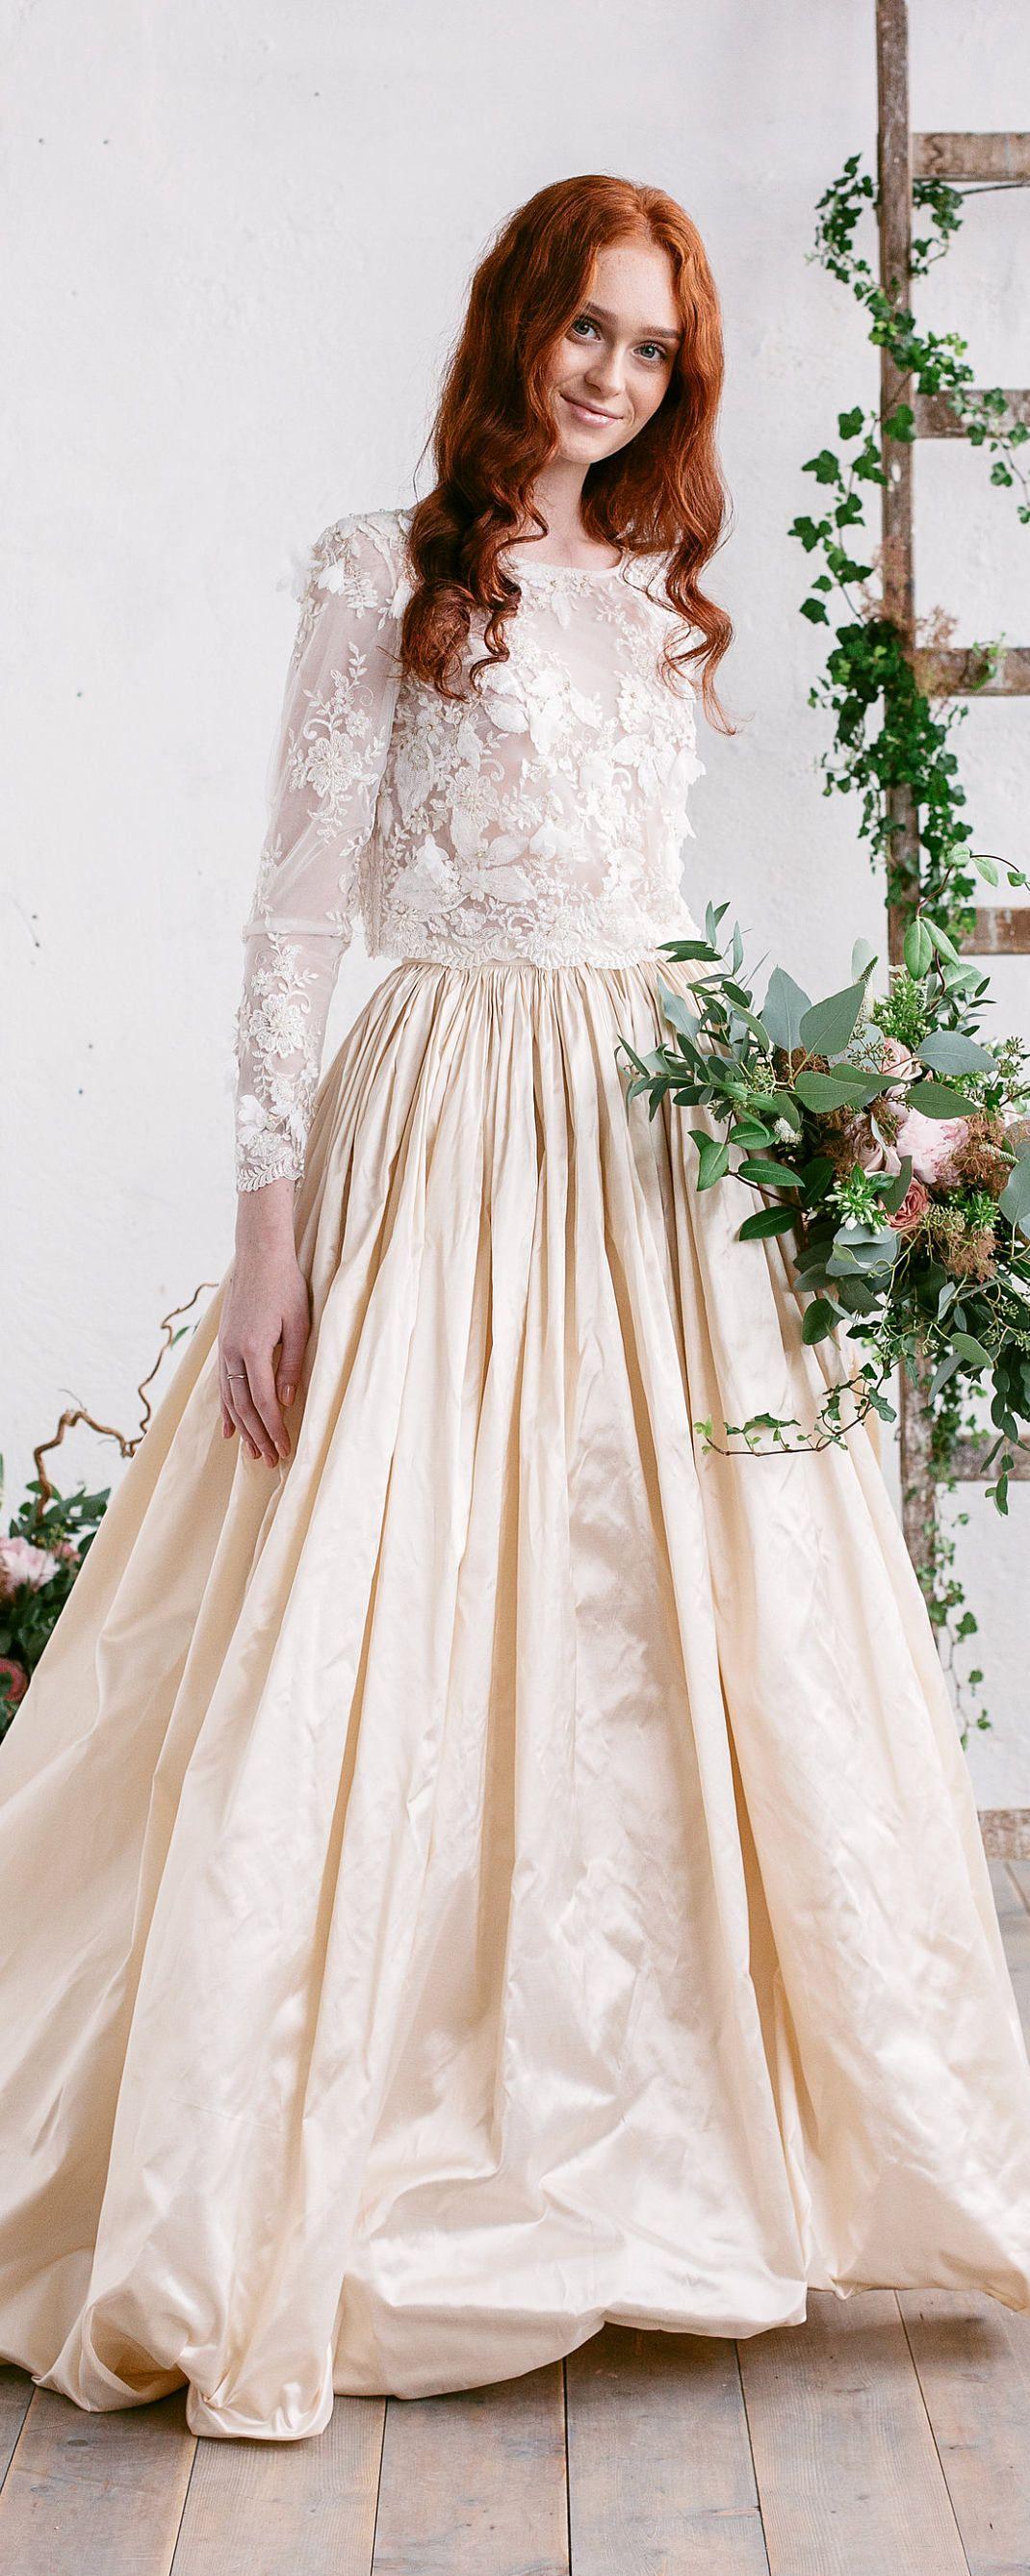 Wedding top bridal lace top bridal separates long sleeves lace